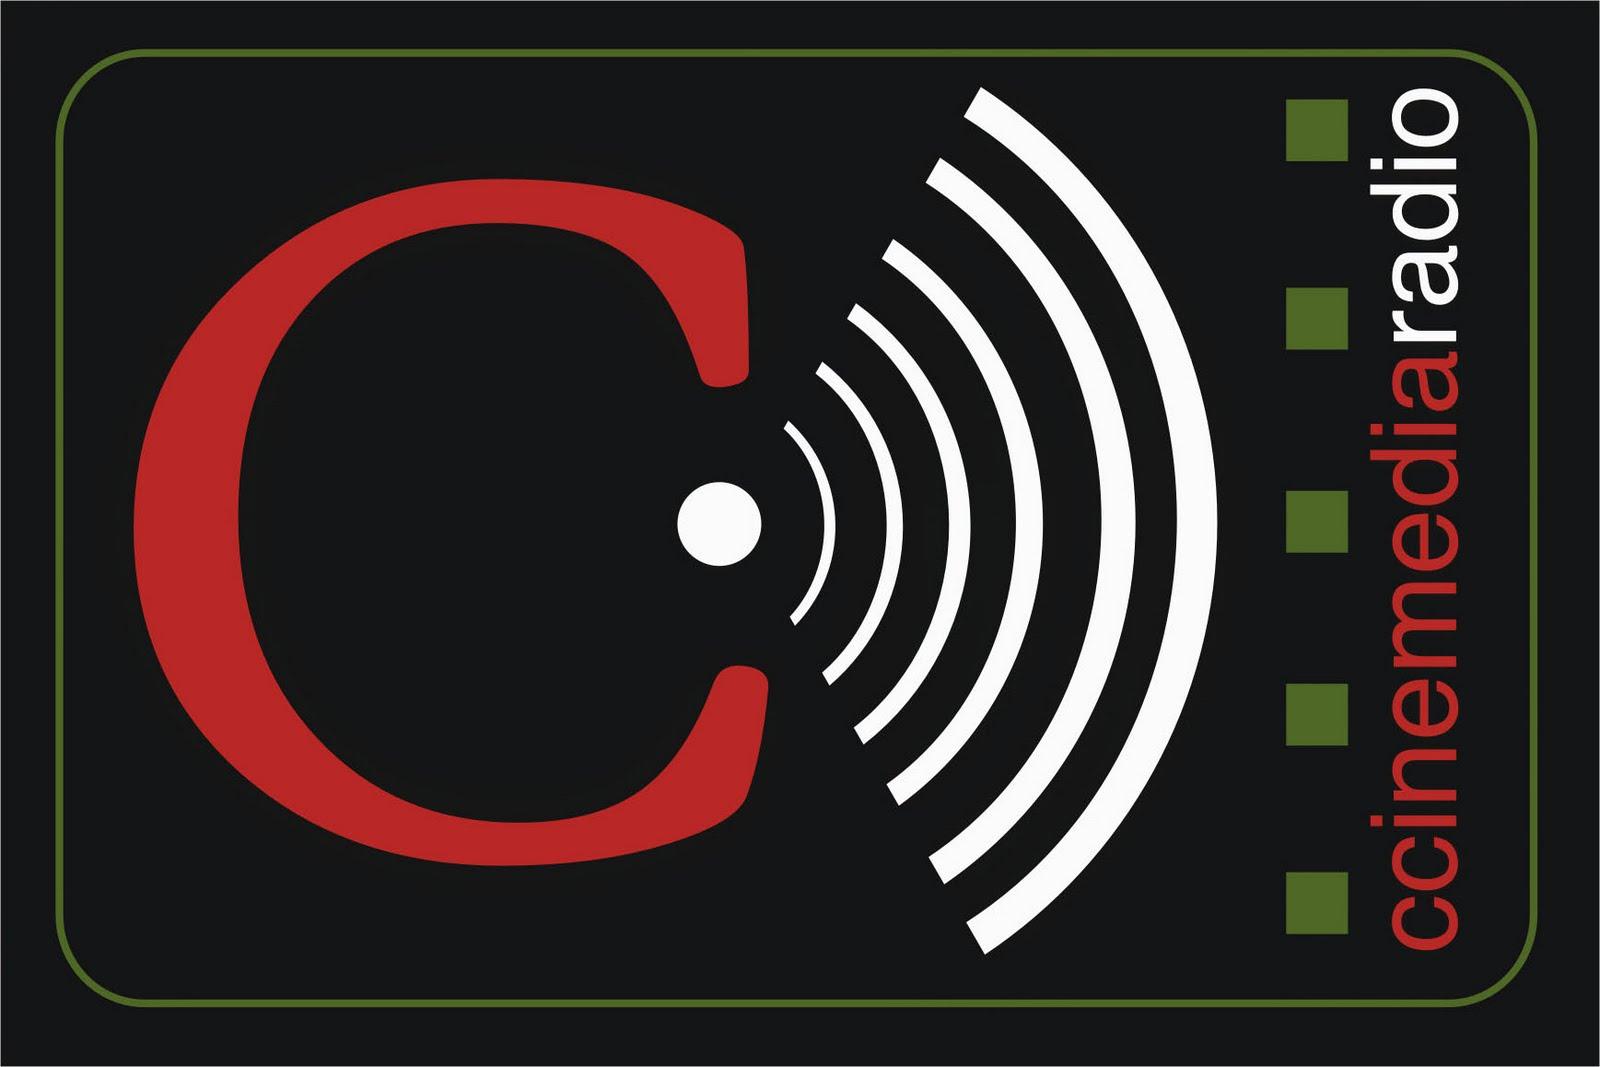 visit ccinemediaradio.mp3